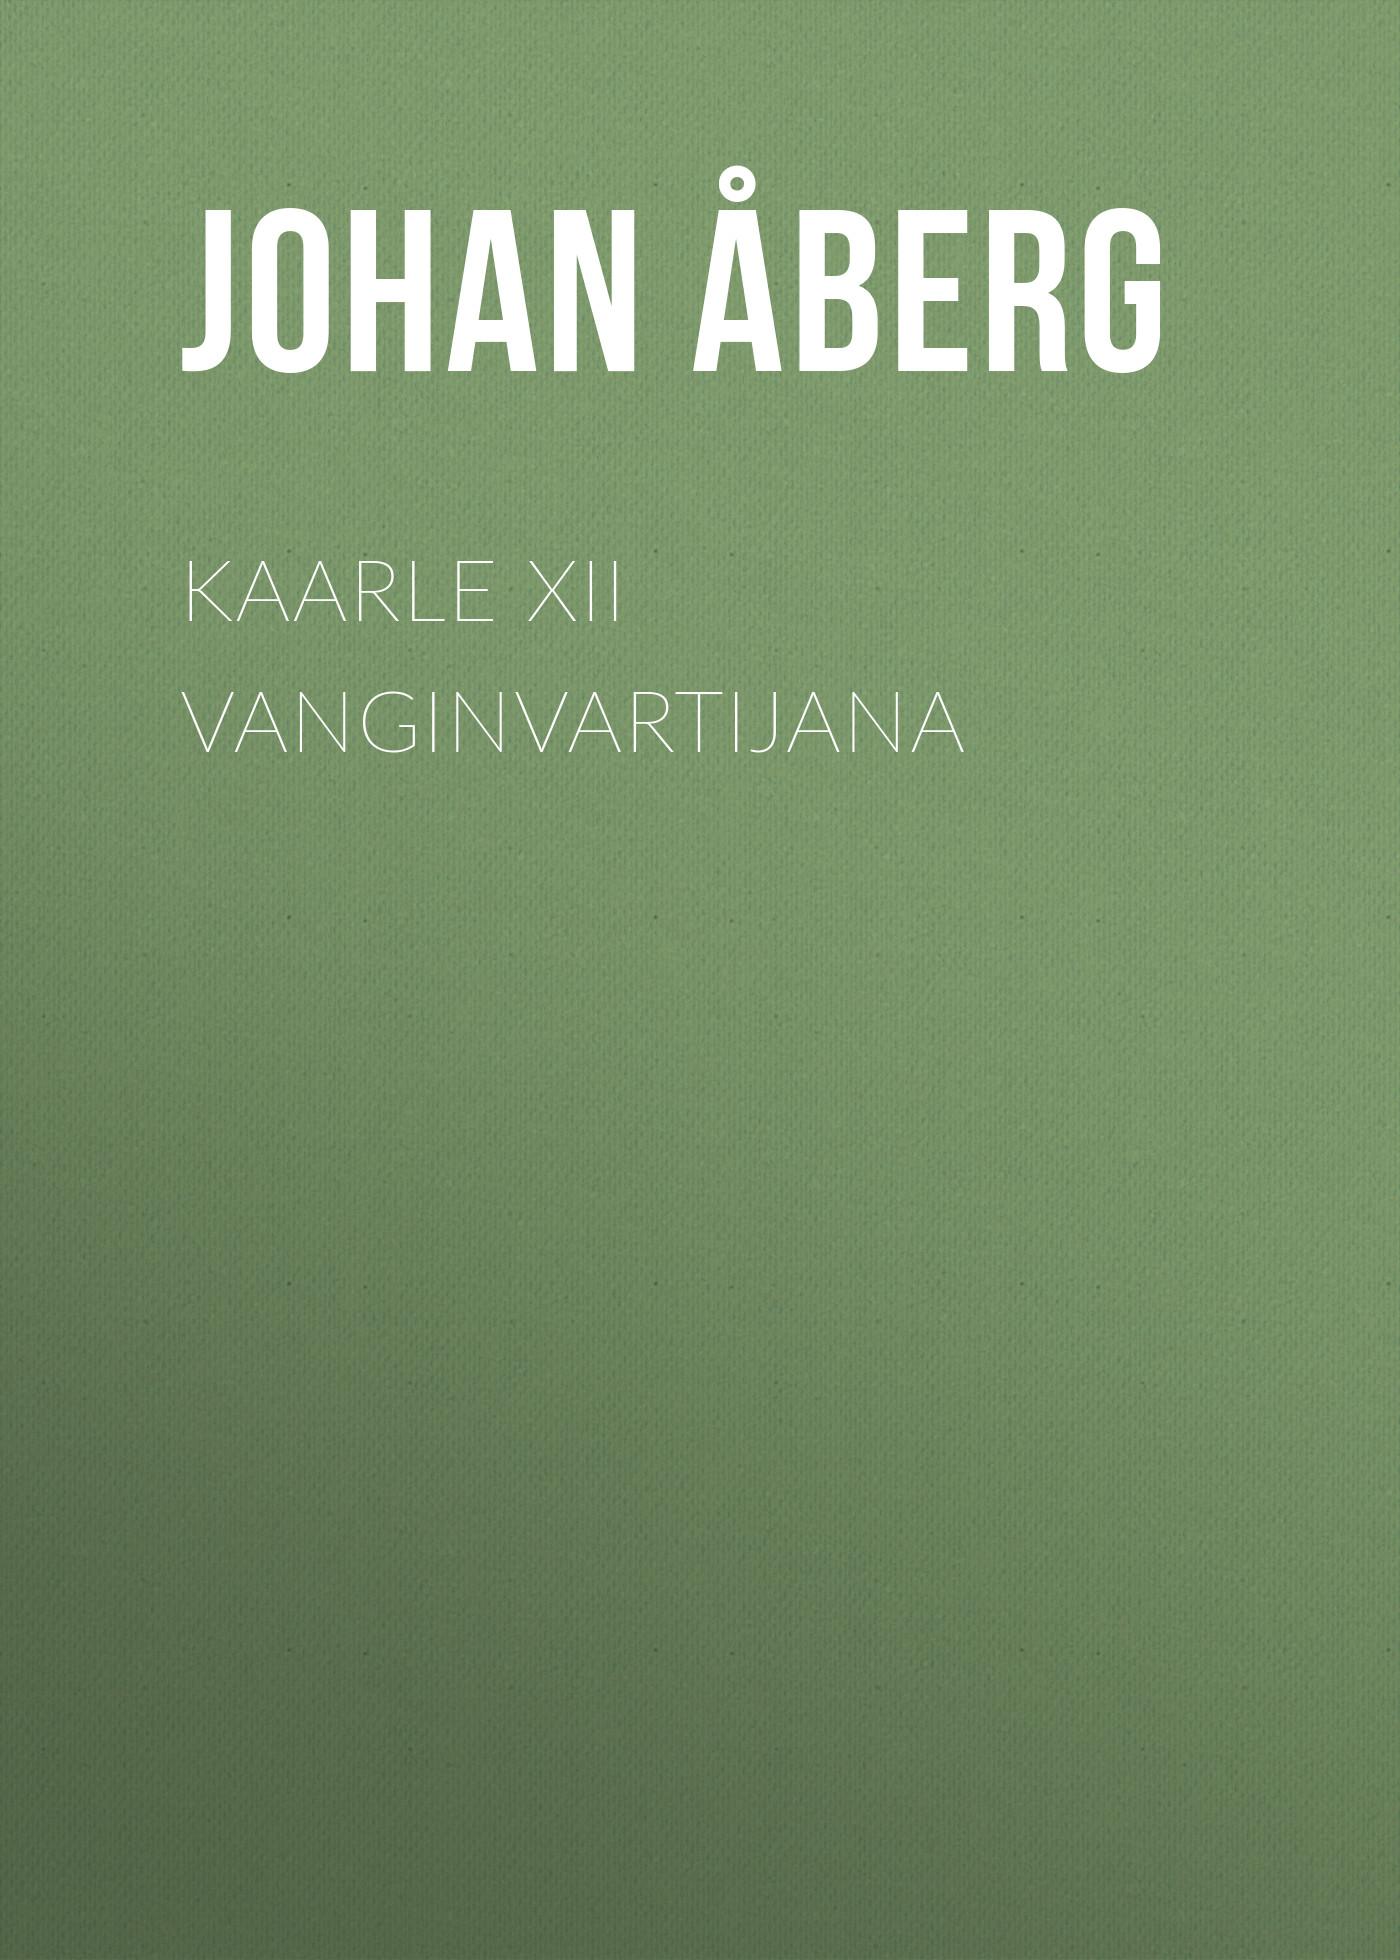 Åberg Johan Olof Kaarle XII vanginvartijana olof bjoerner olof s files a bob dylan performance guide volume 2 1970 1977